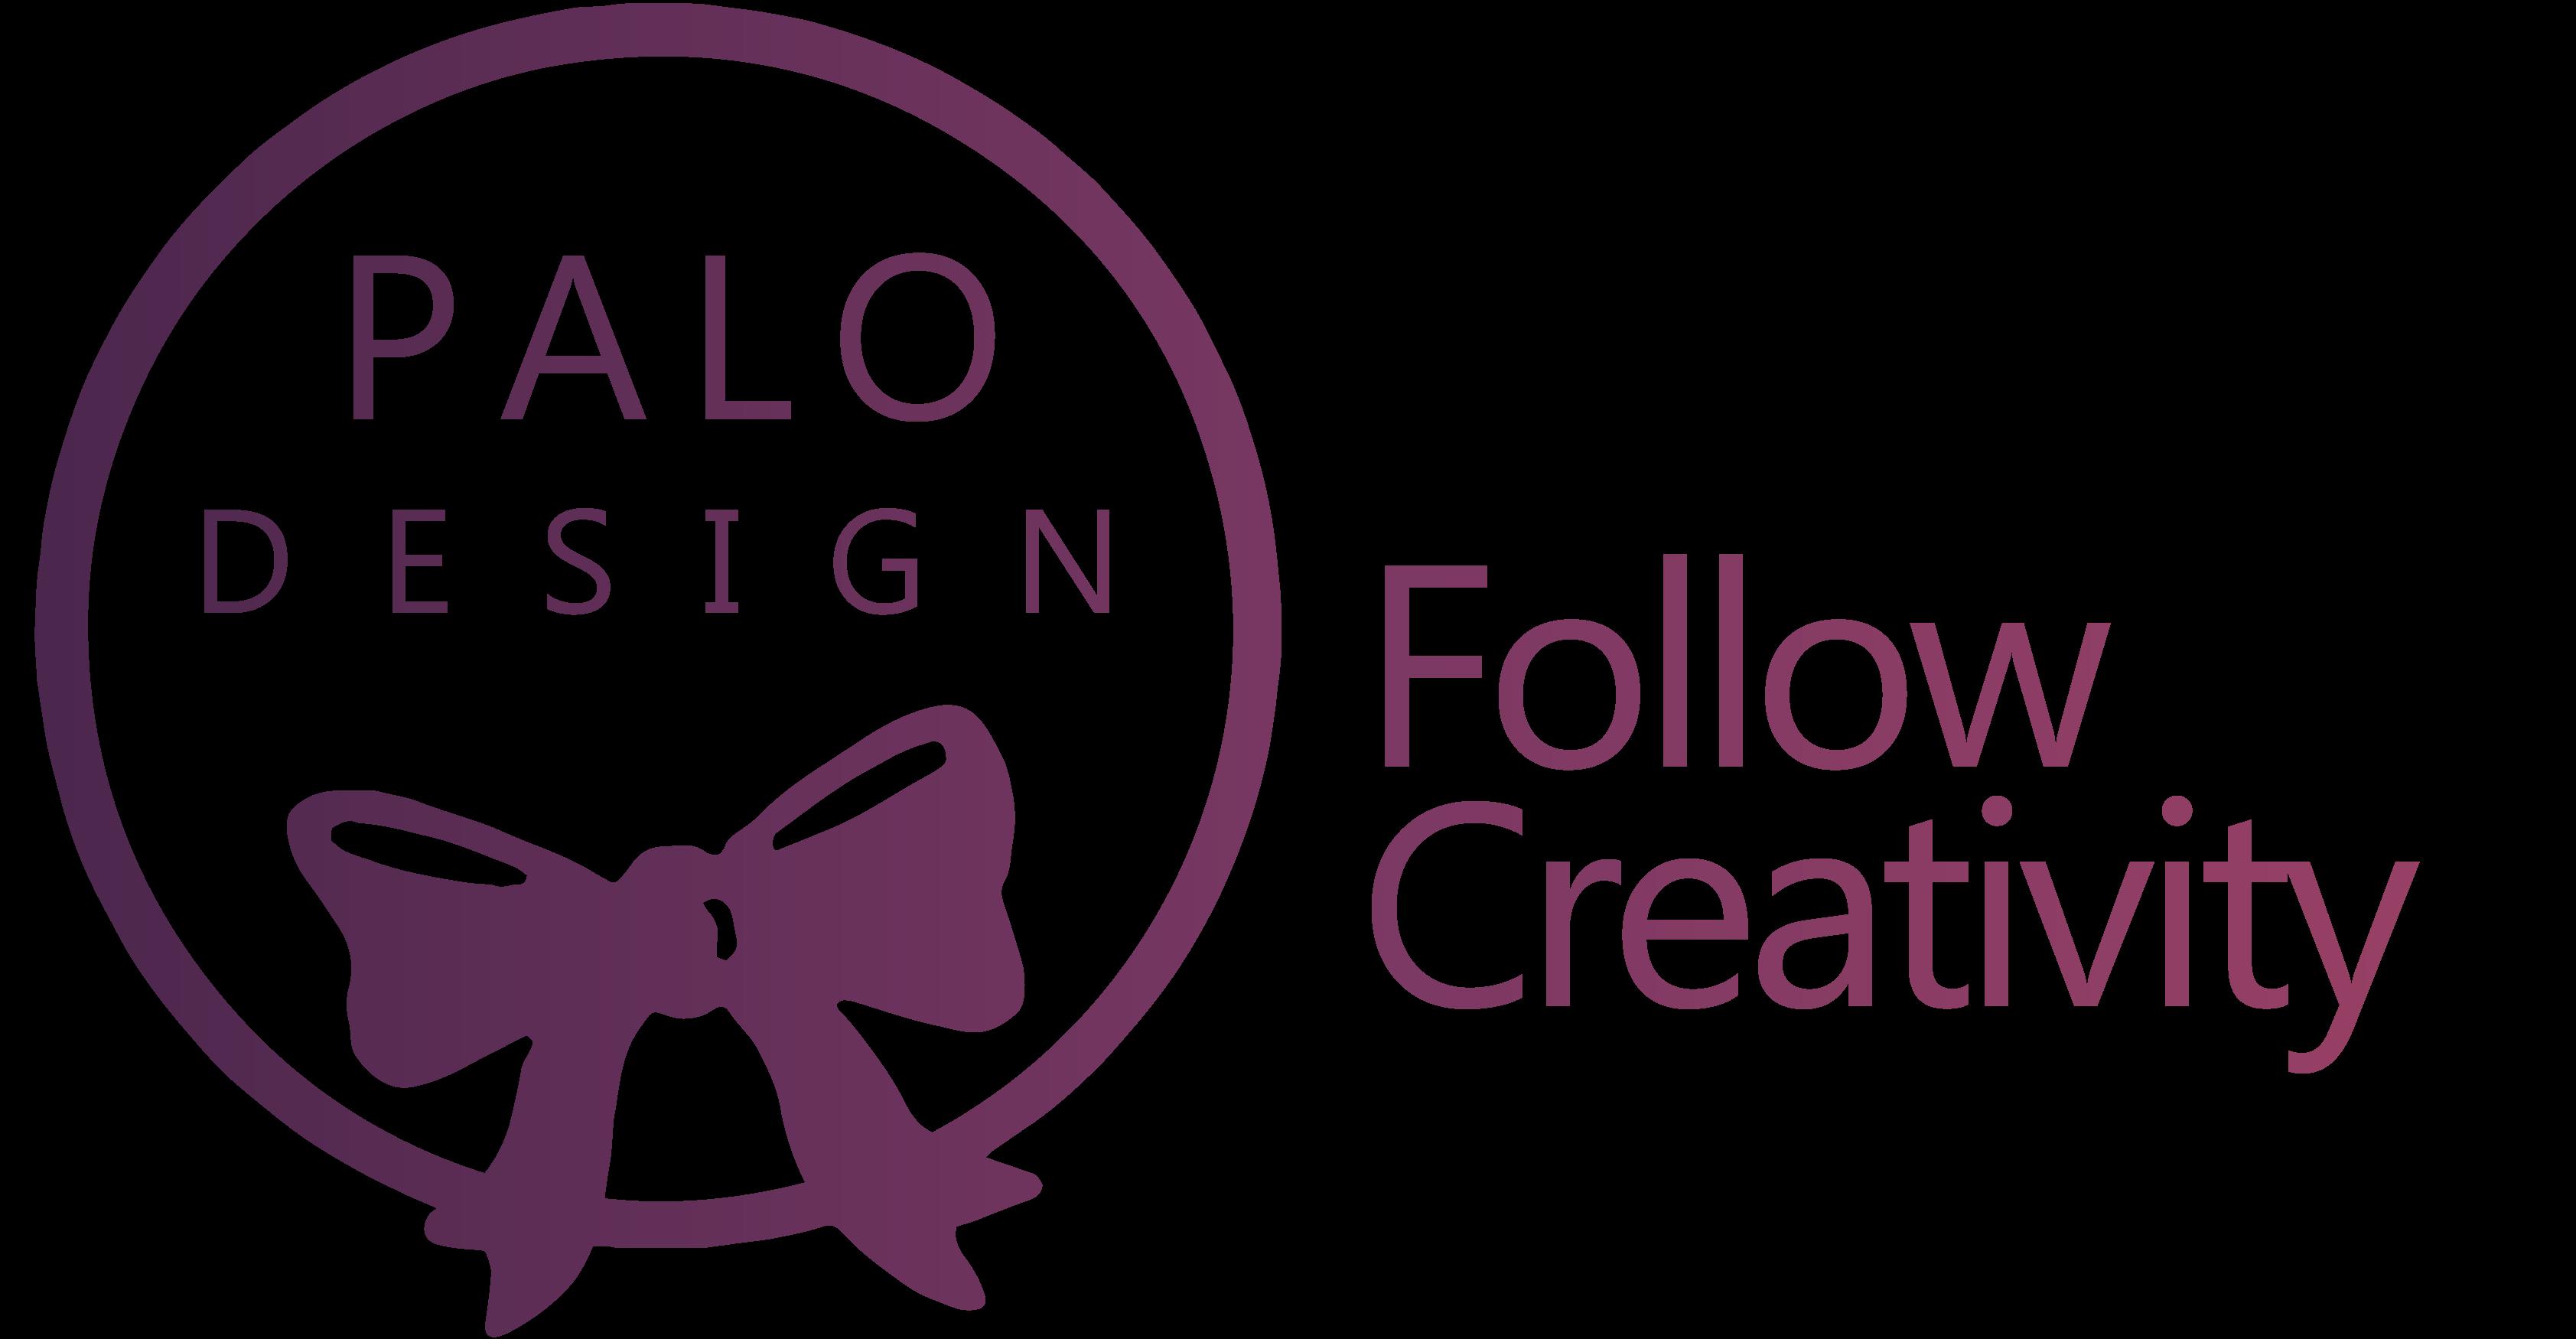 PALO Design